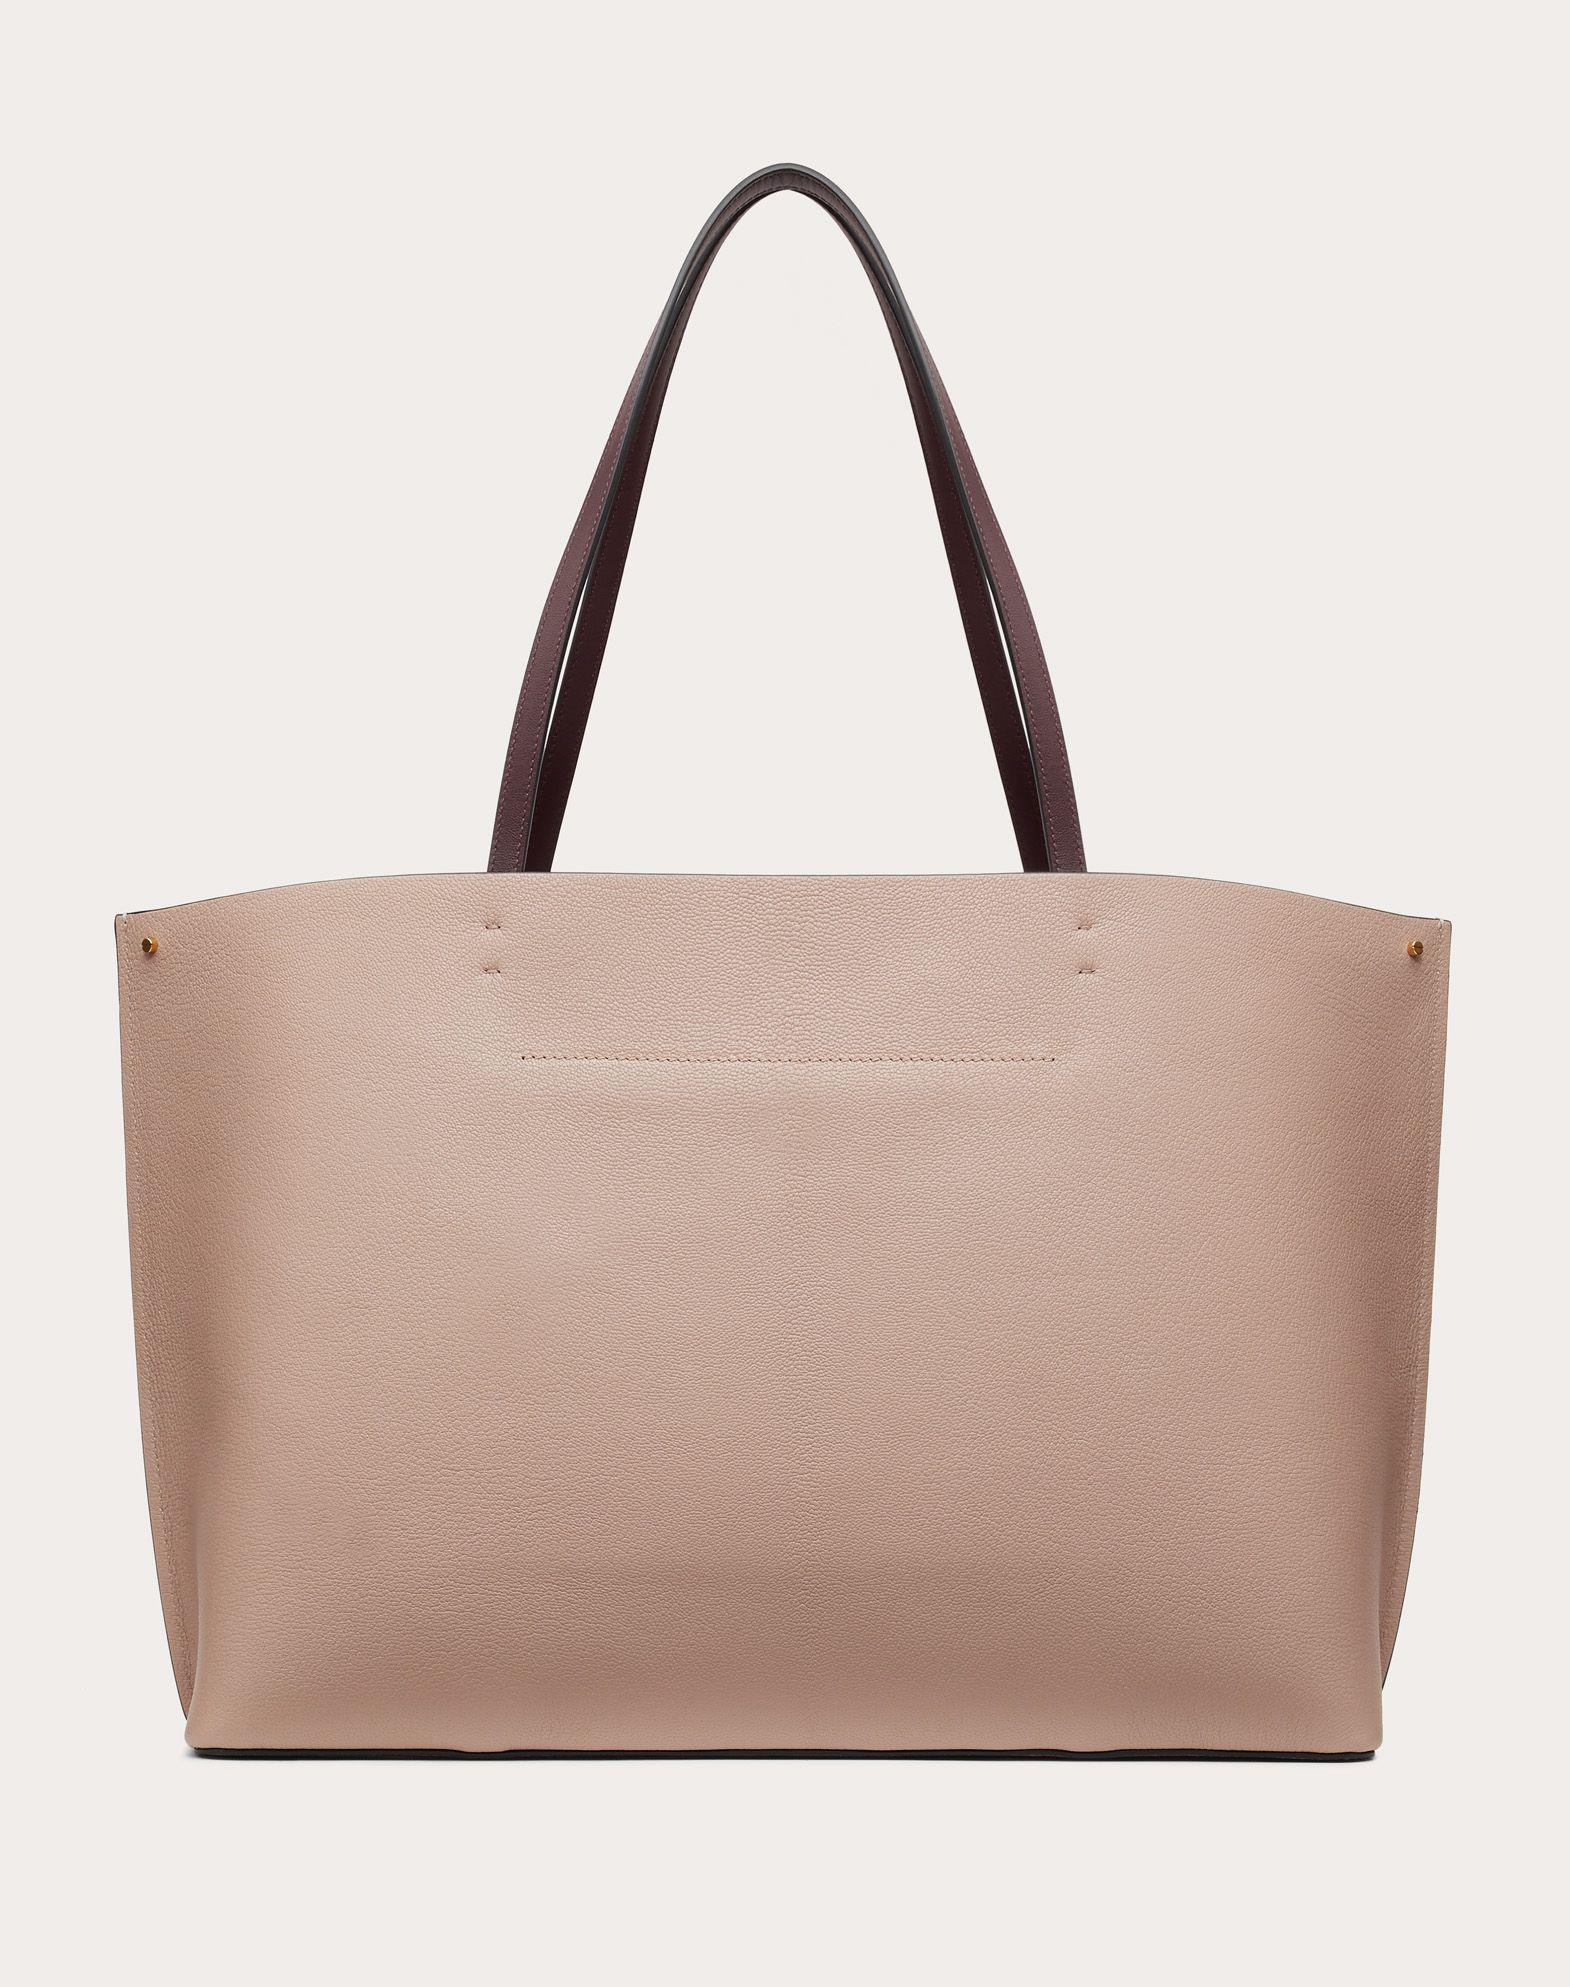 Fillme Tote Bag